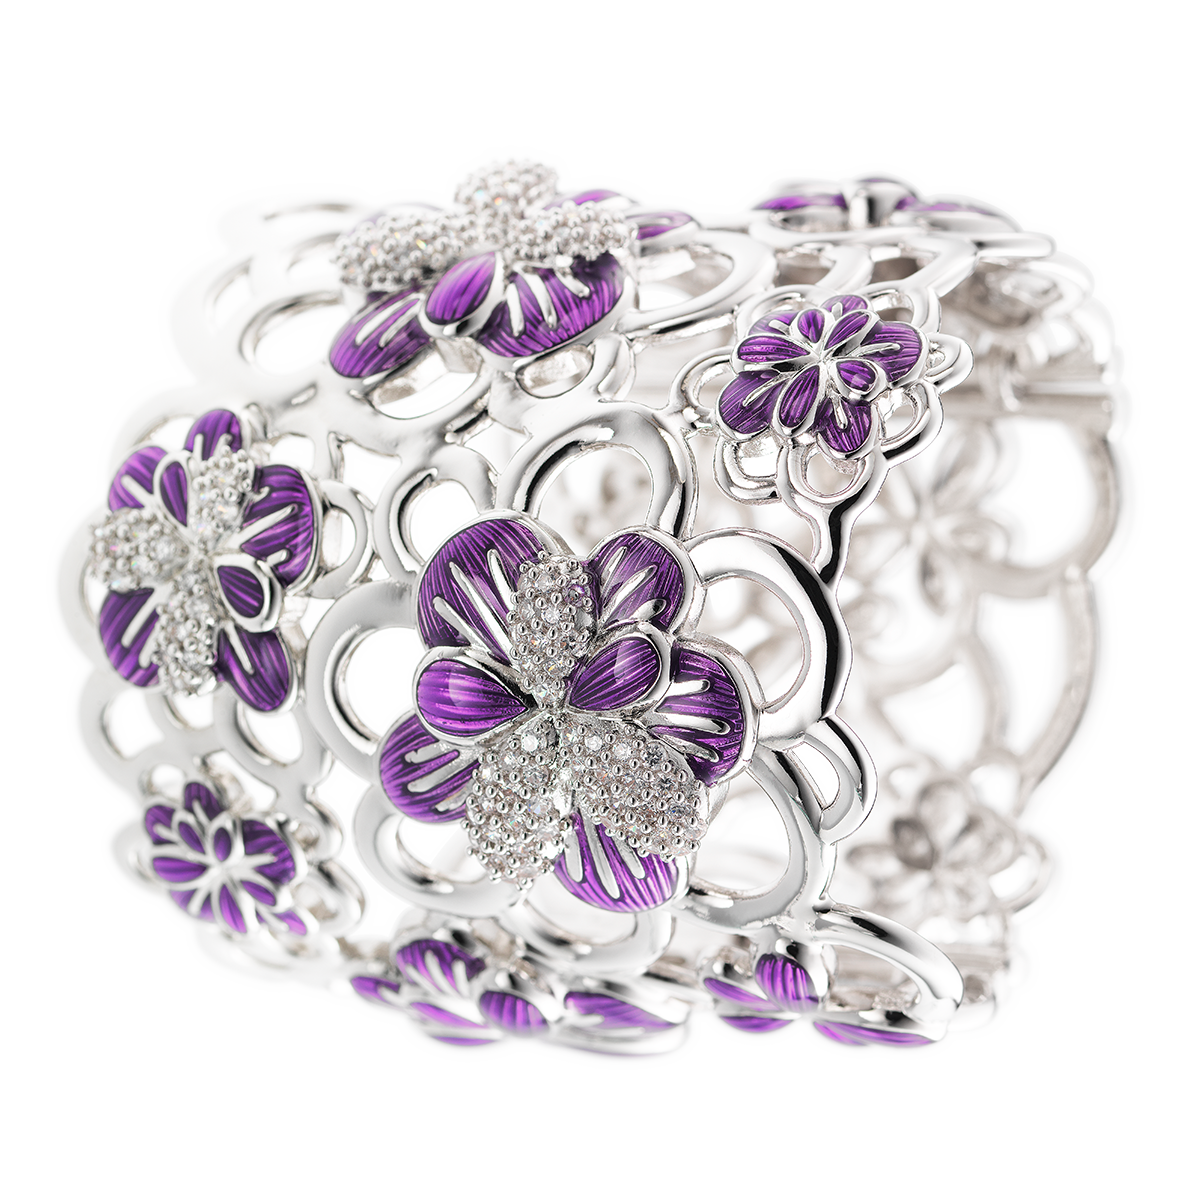 CIRO Jewelry Traviata white gold arm cuff. Interlacing floral design cuff. White CIROLIT stones. Lilac enamel. Secure clip closing. White gold plated.